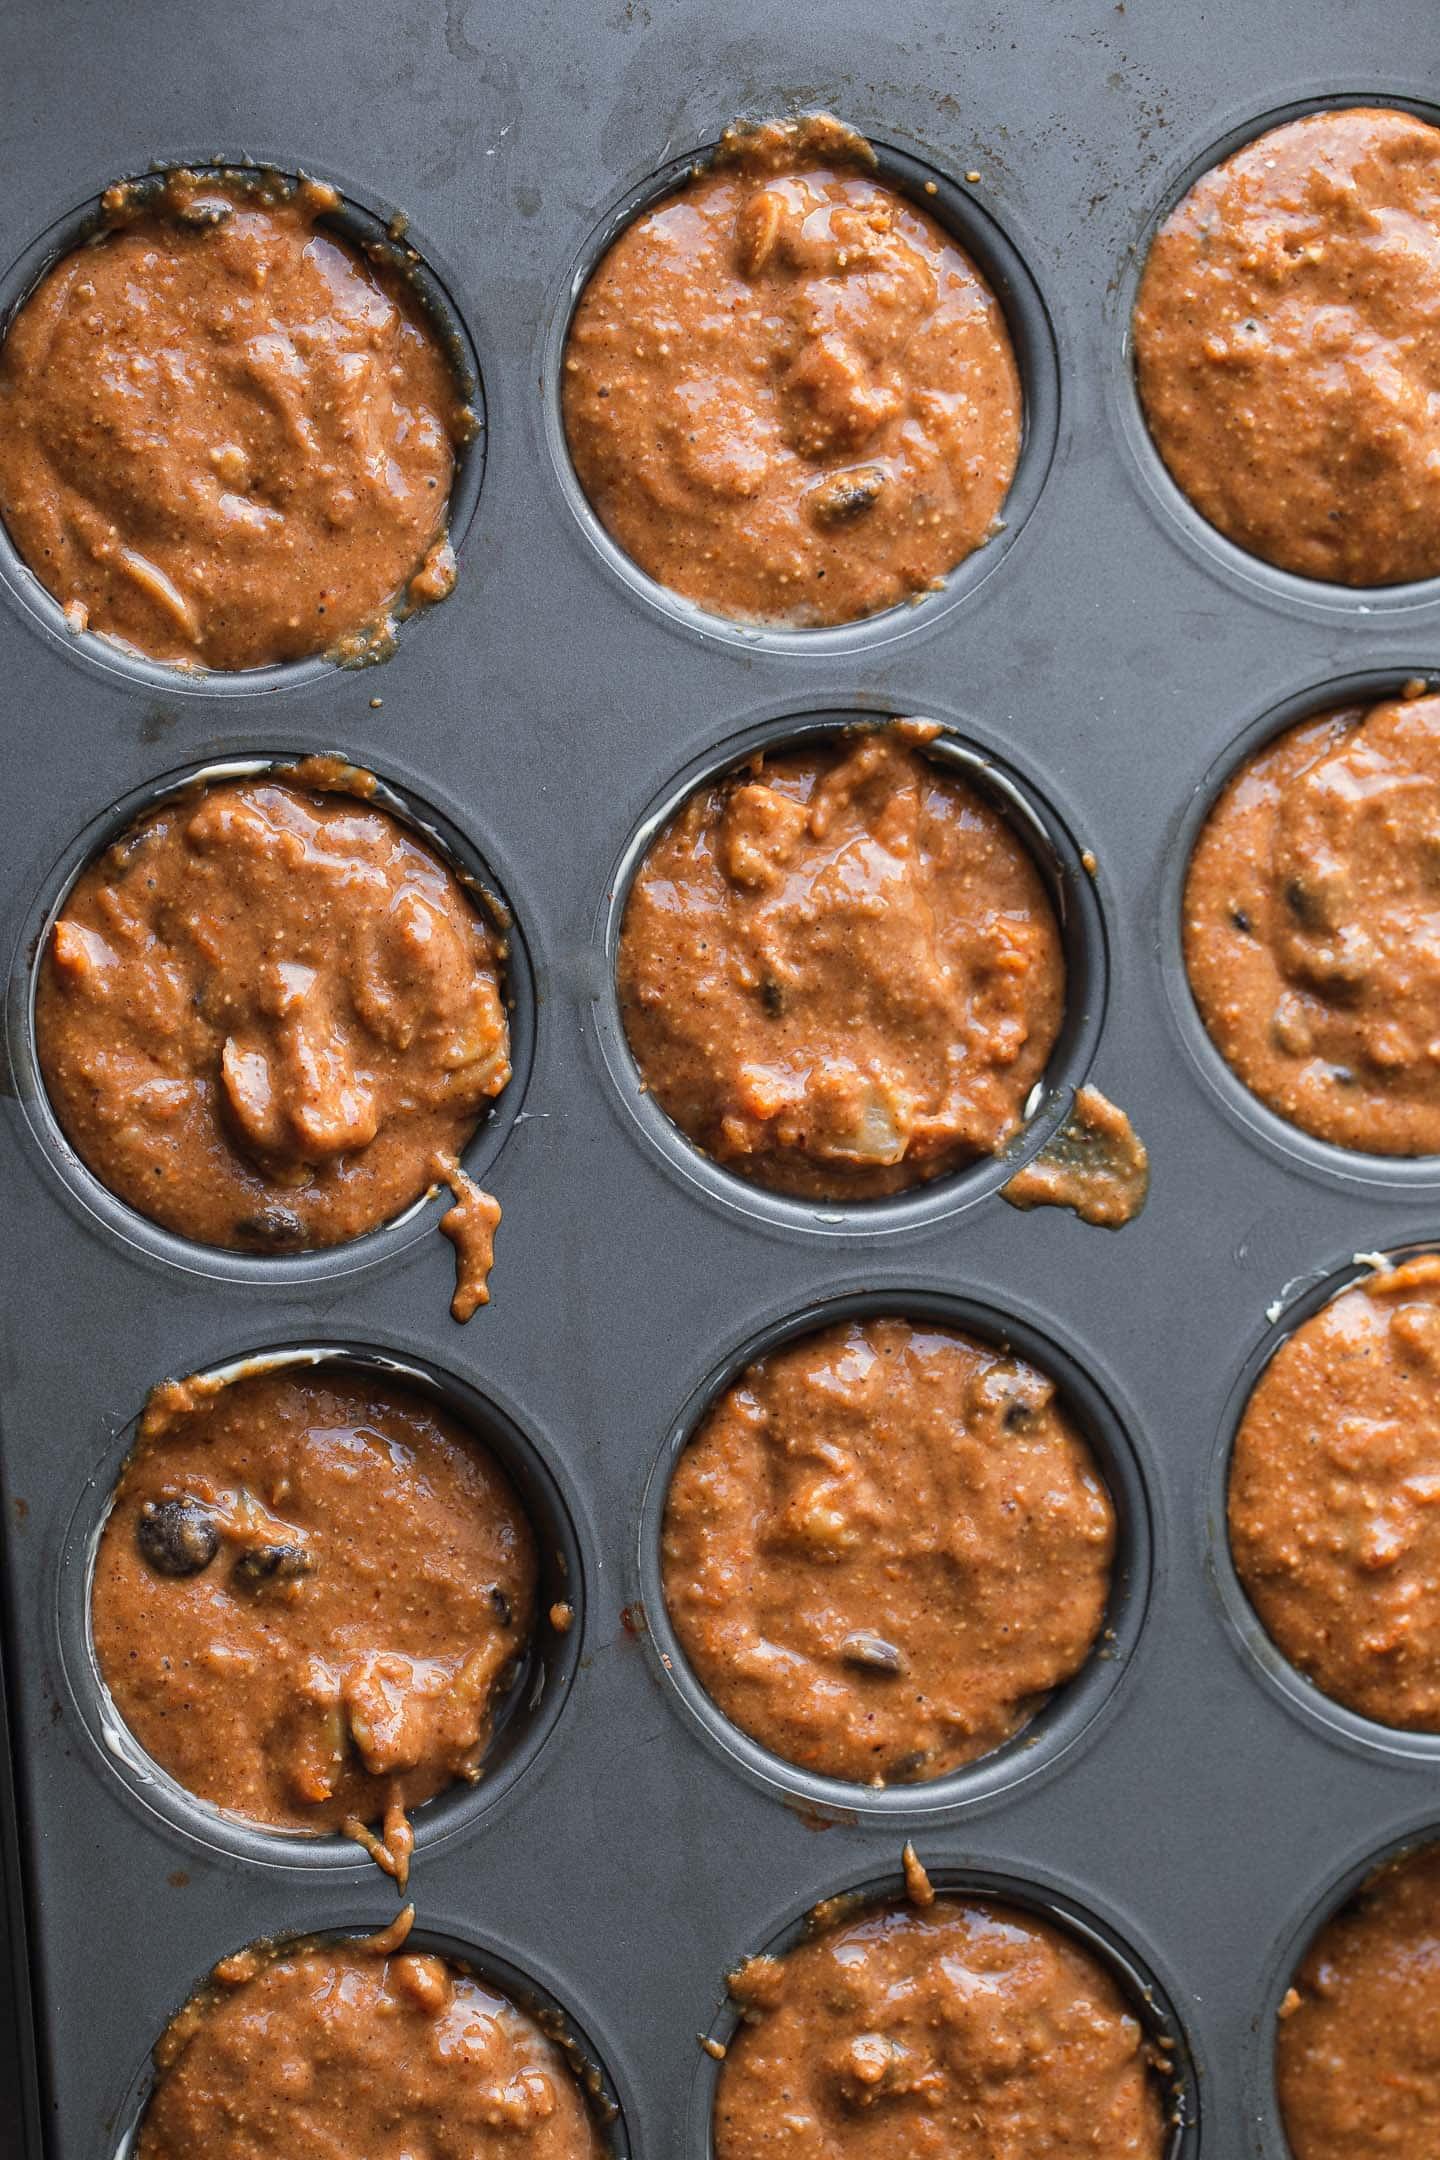 Pumpkin muffin batter in a muffin tray